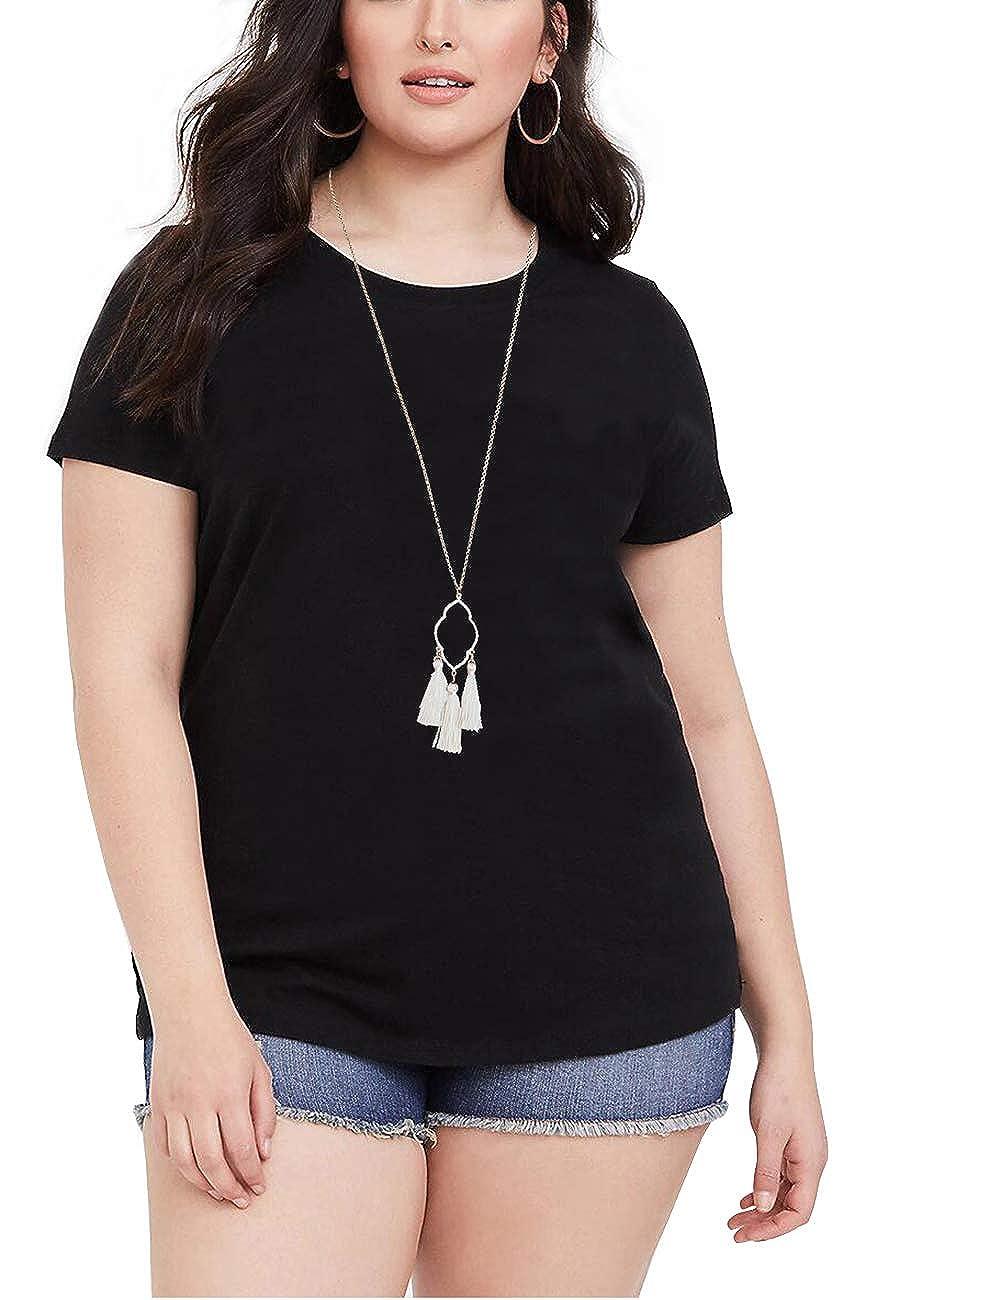 01black deqiang Women's Plus Size Shirts Summer Short Sleeves Comfy Casual Basic Tops Tee XL5XL